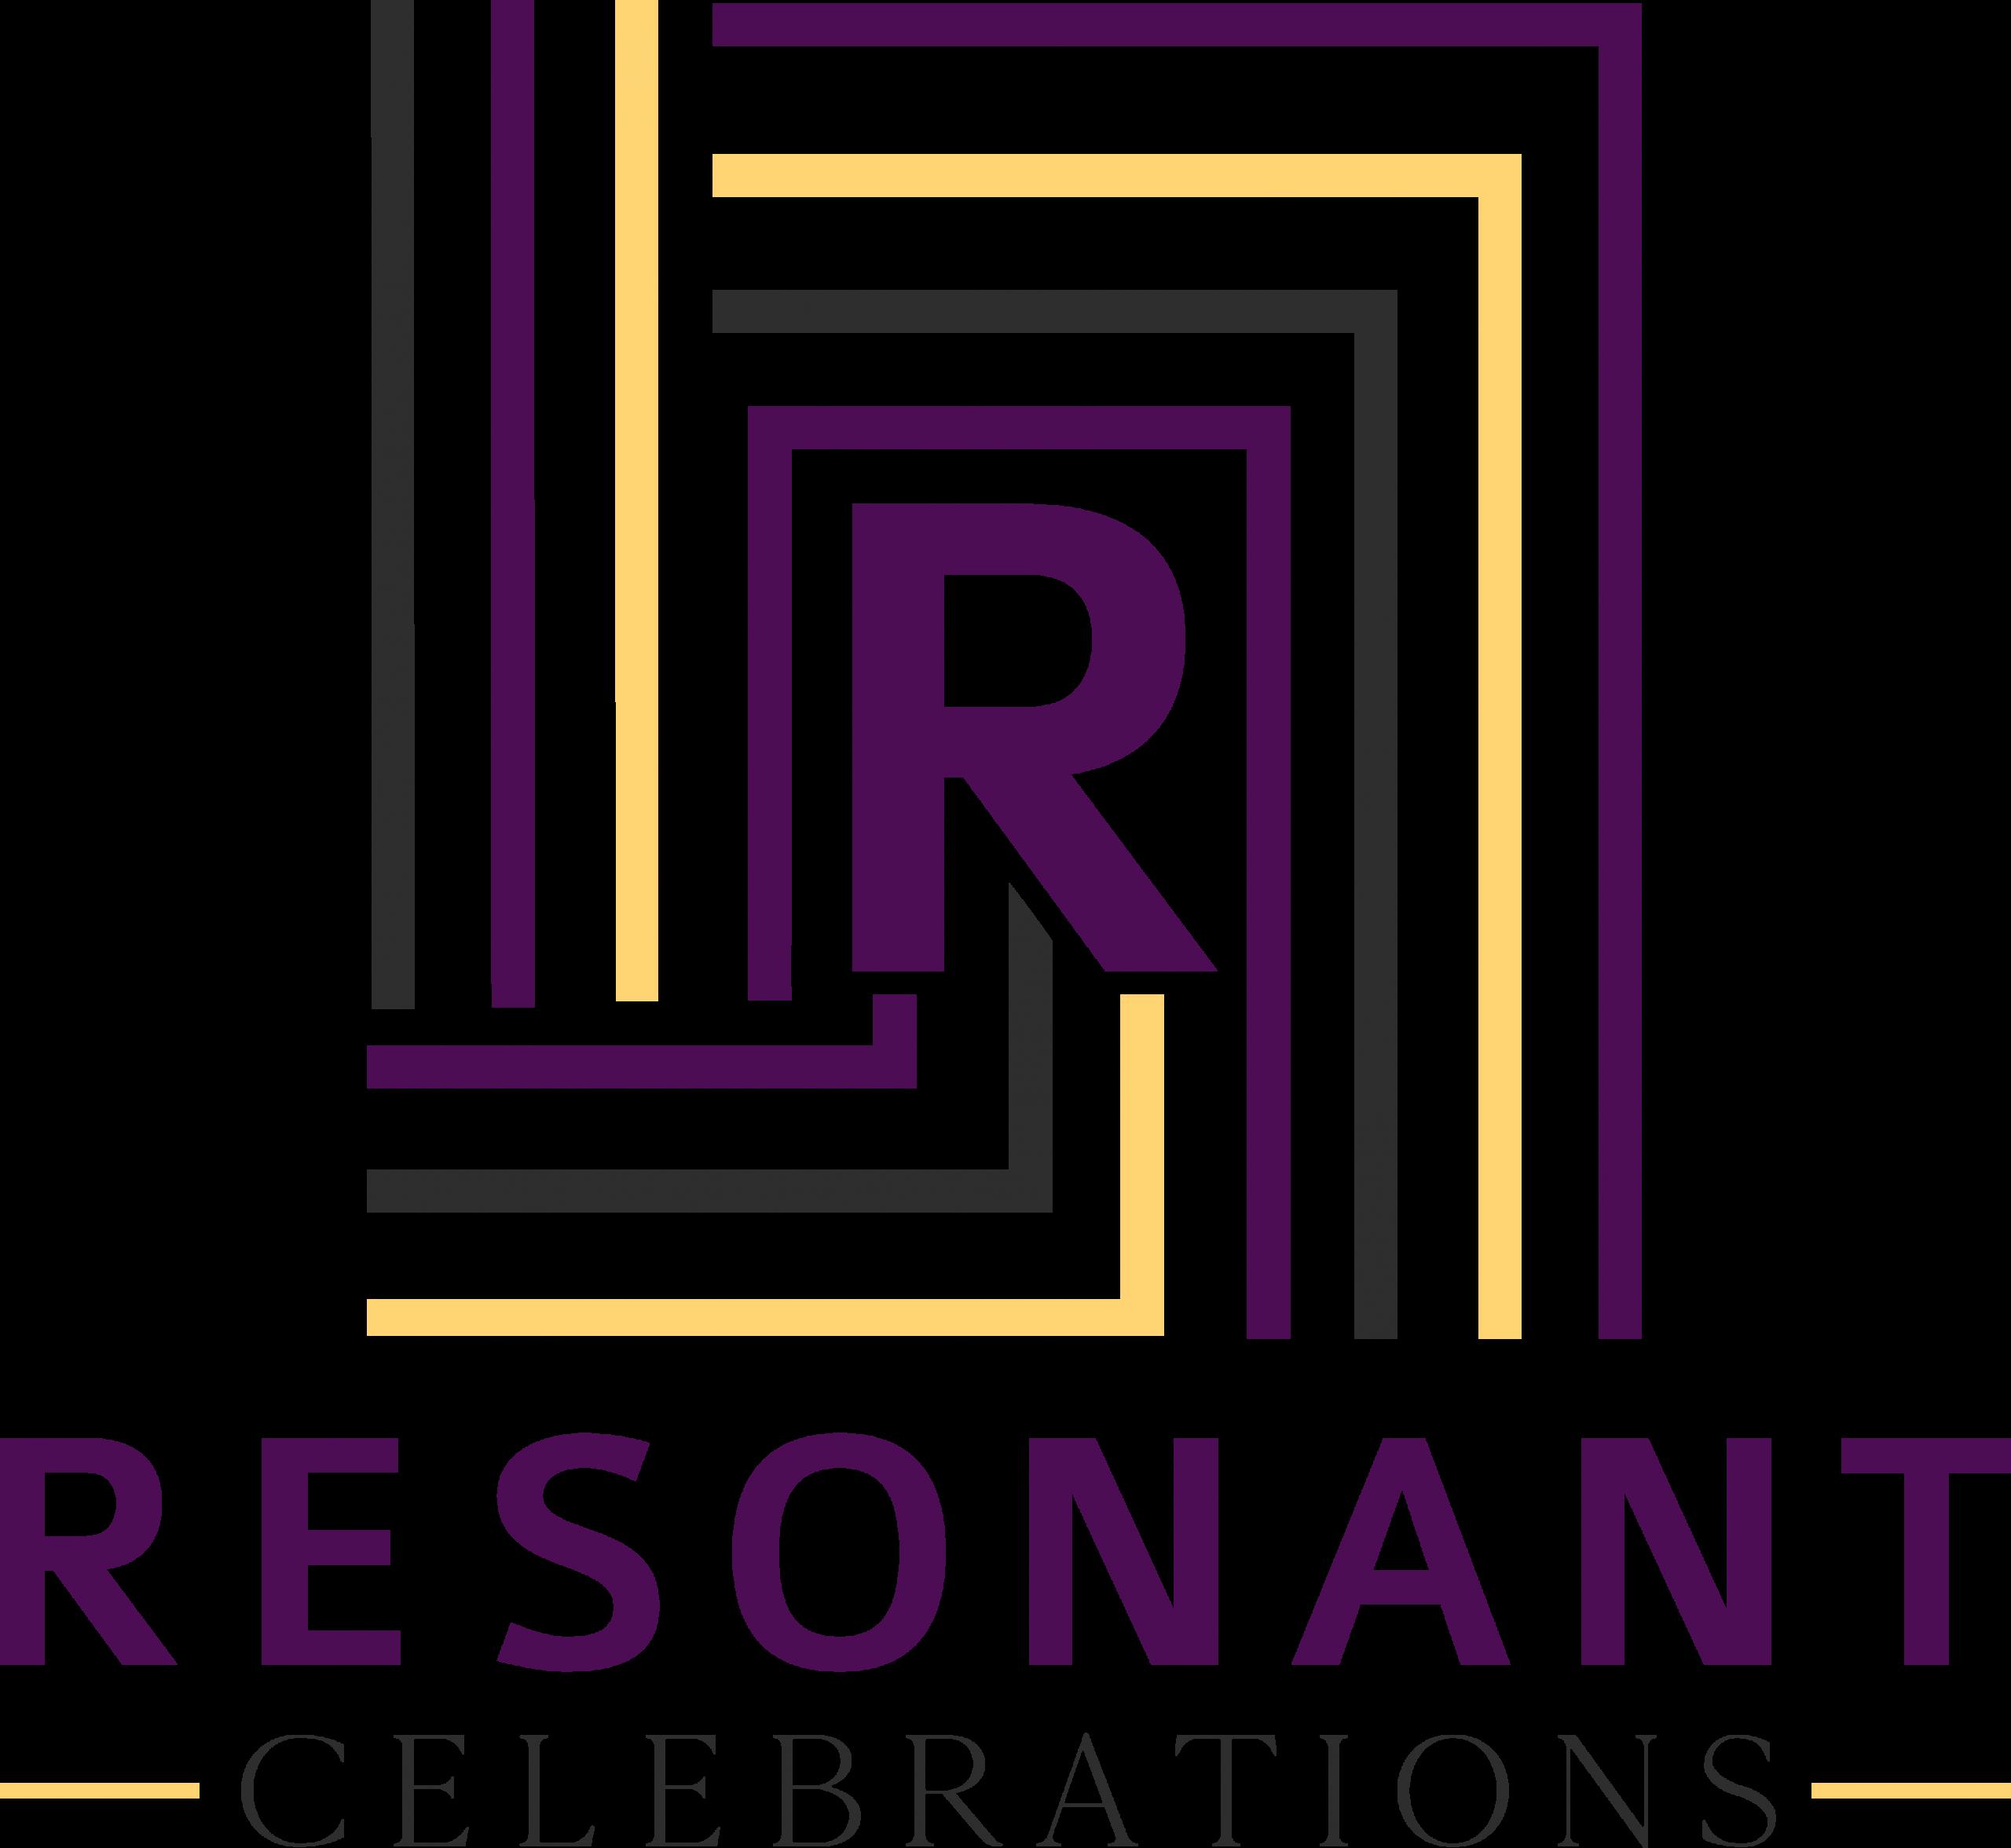 Resonant Celebrations